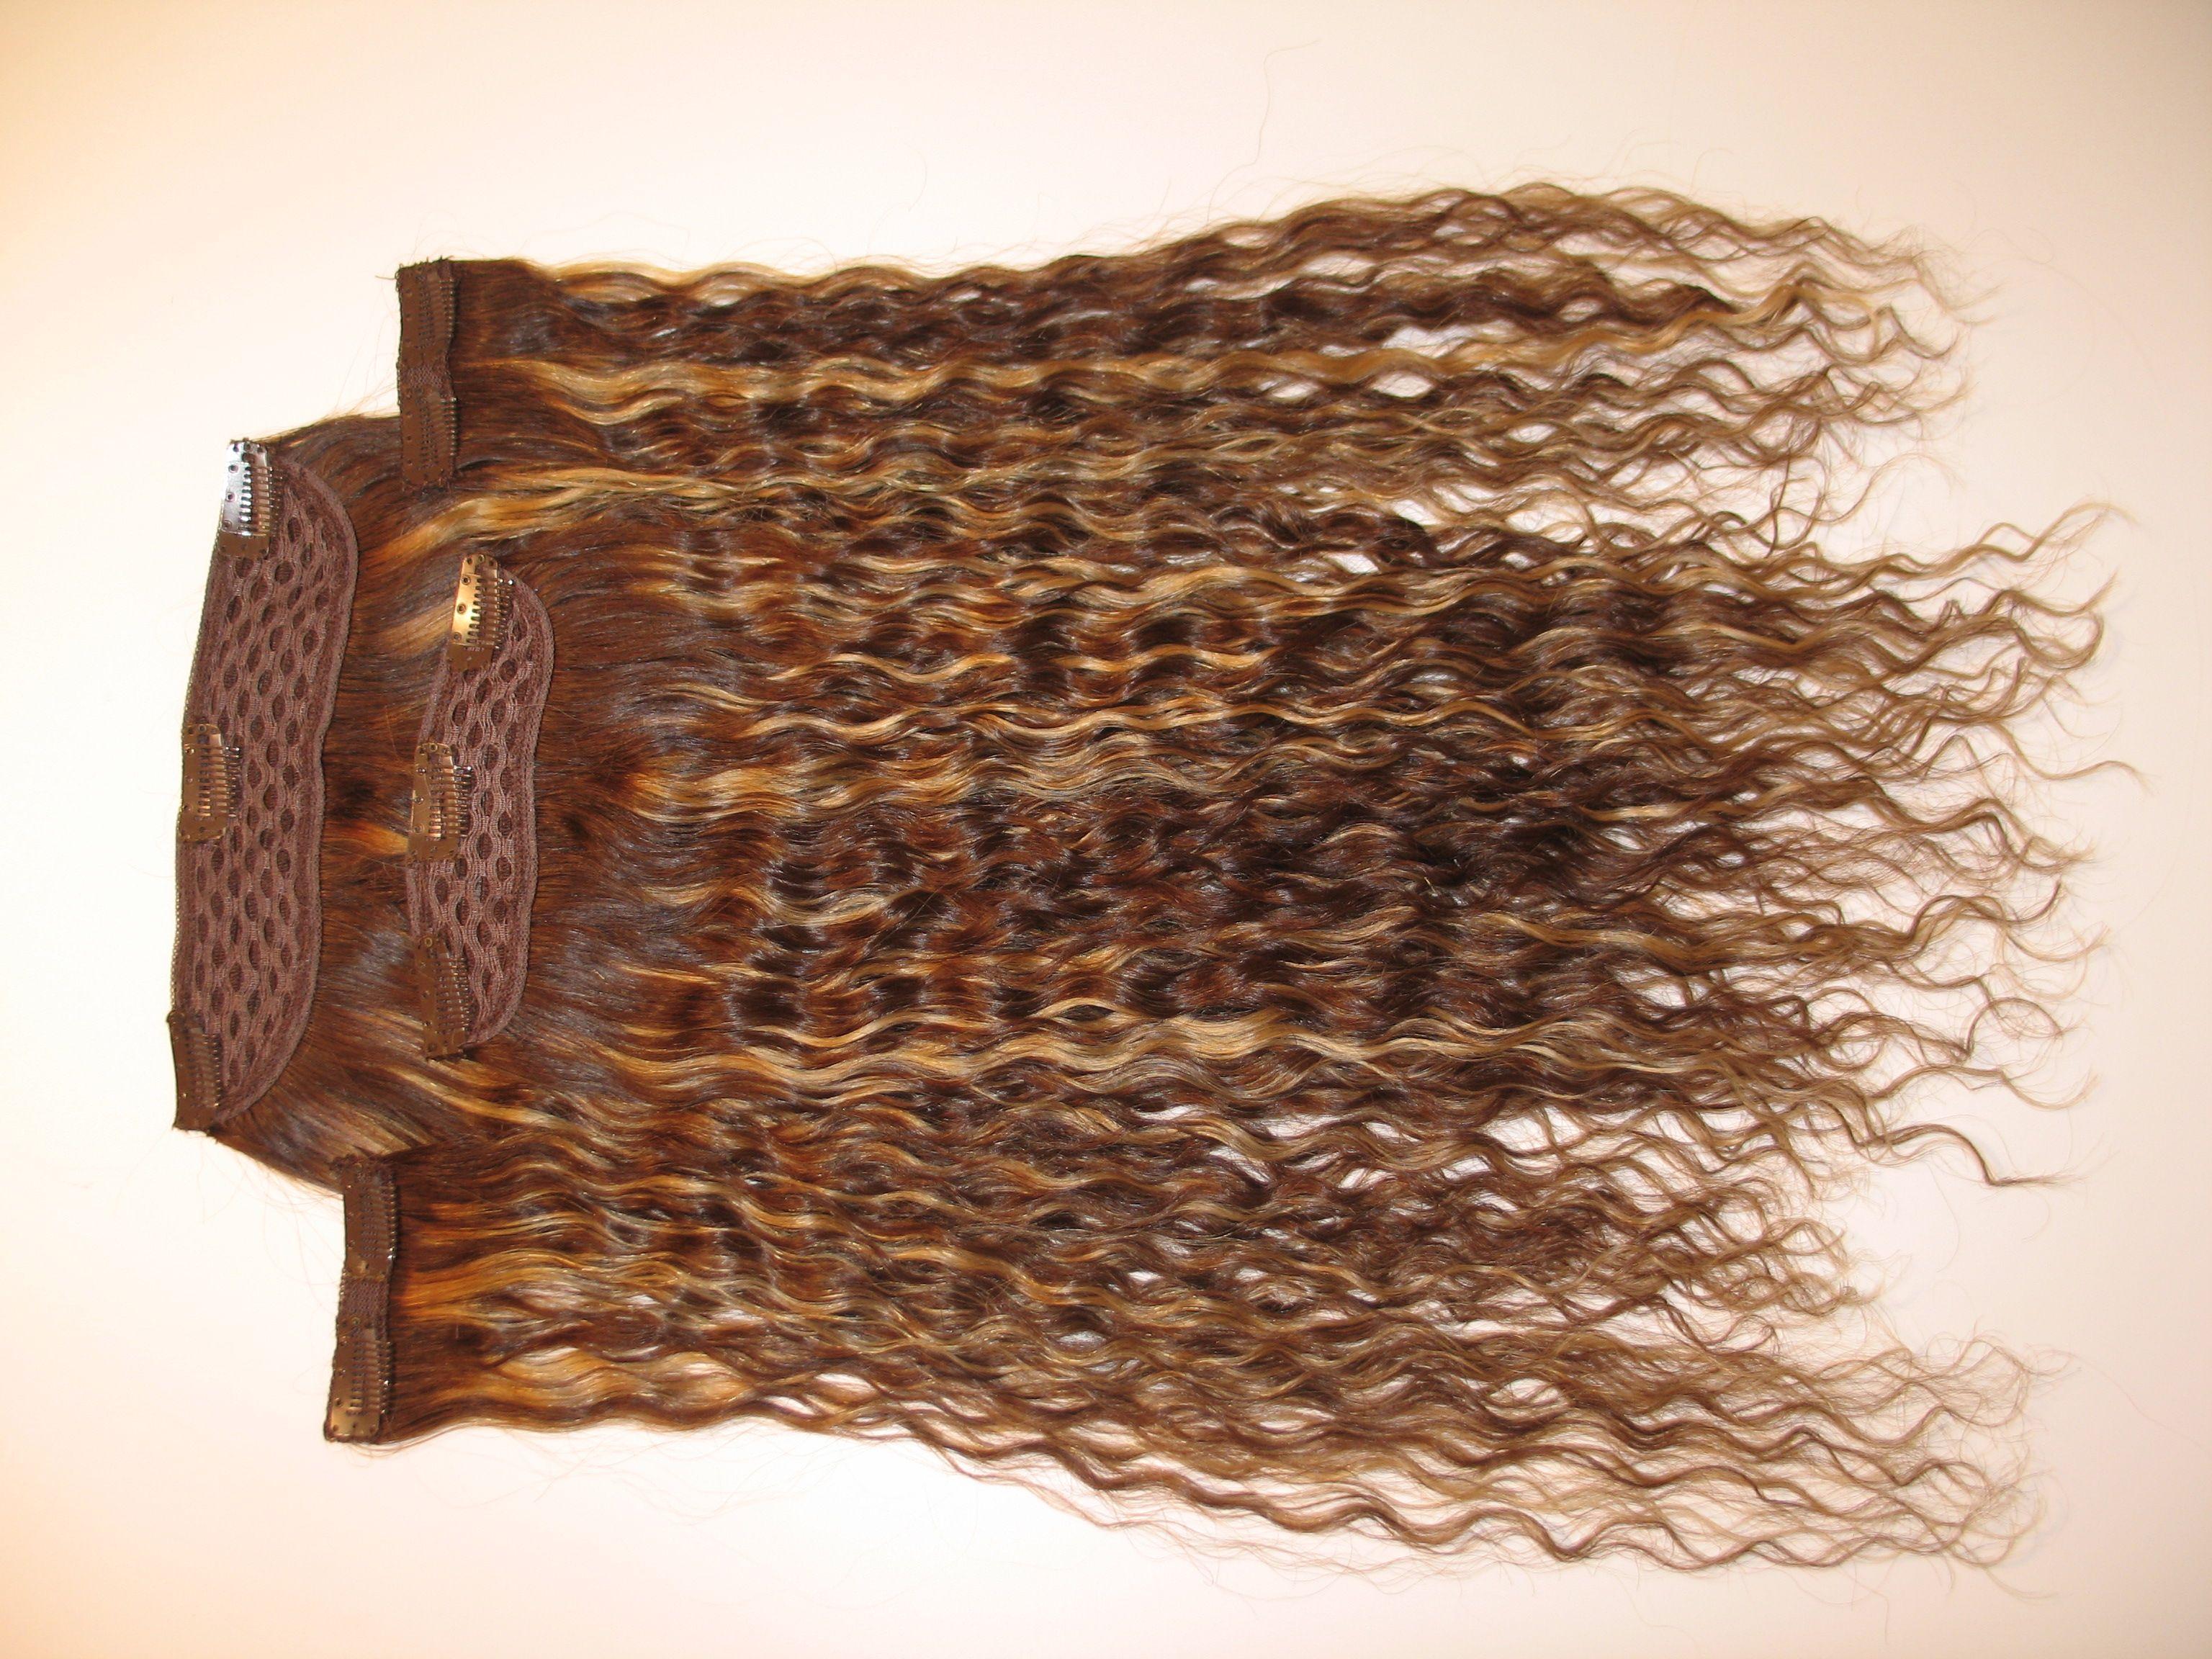 100 Dogal Saclar Style Sac Yarimay Citcit Naturalhair Dogal